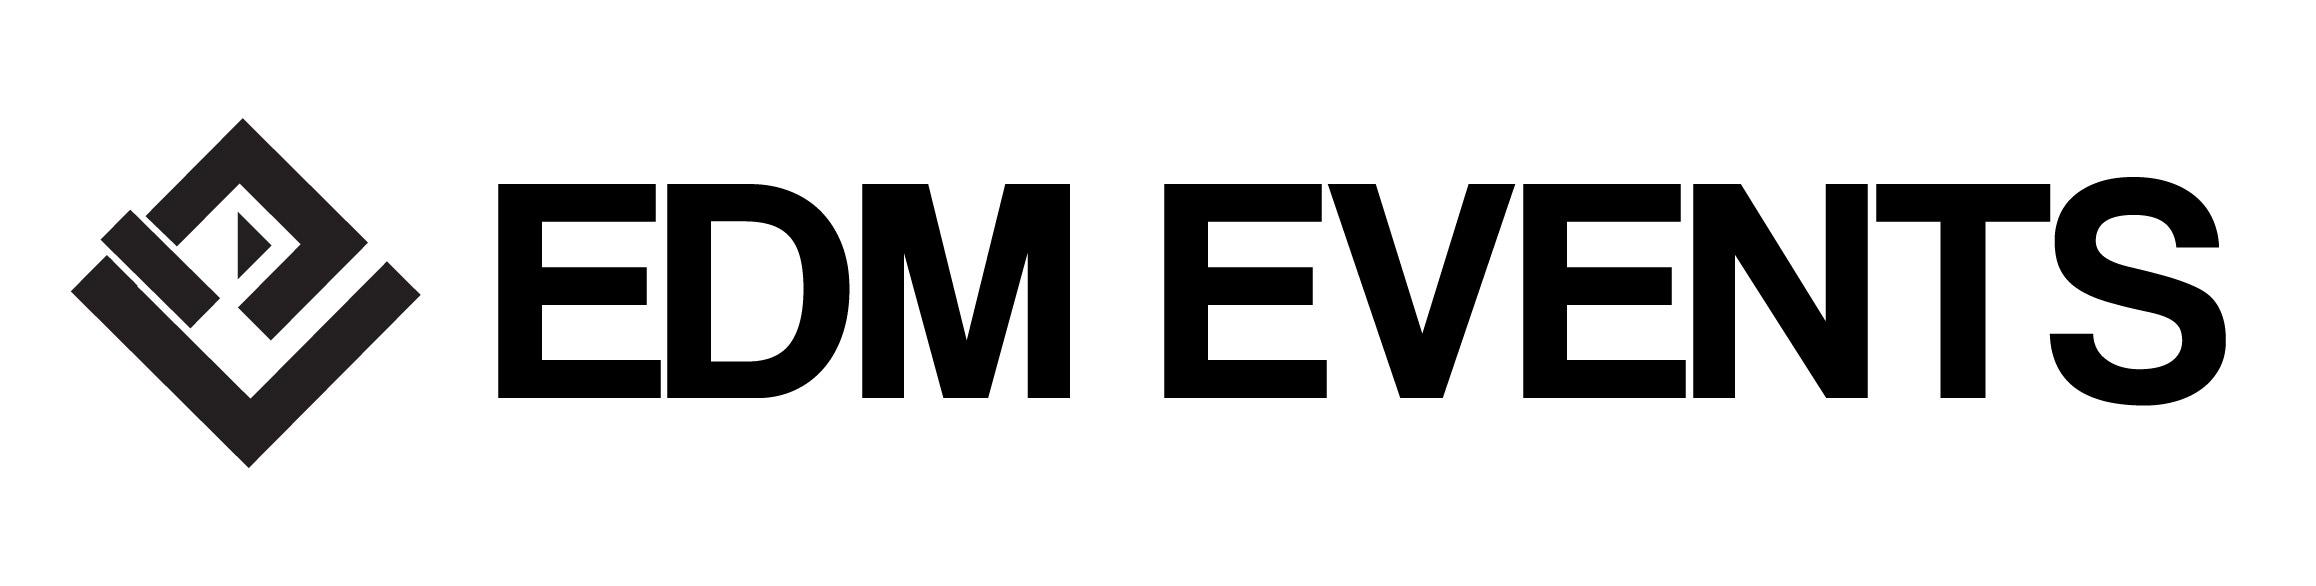 EDM Events Final Master 1.5 scott-01.jpg